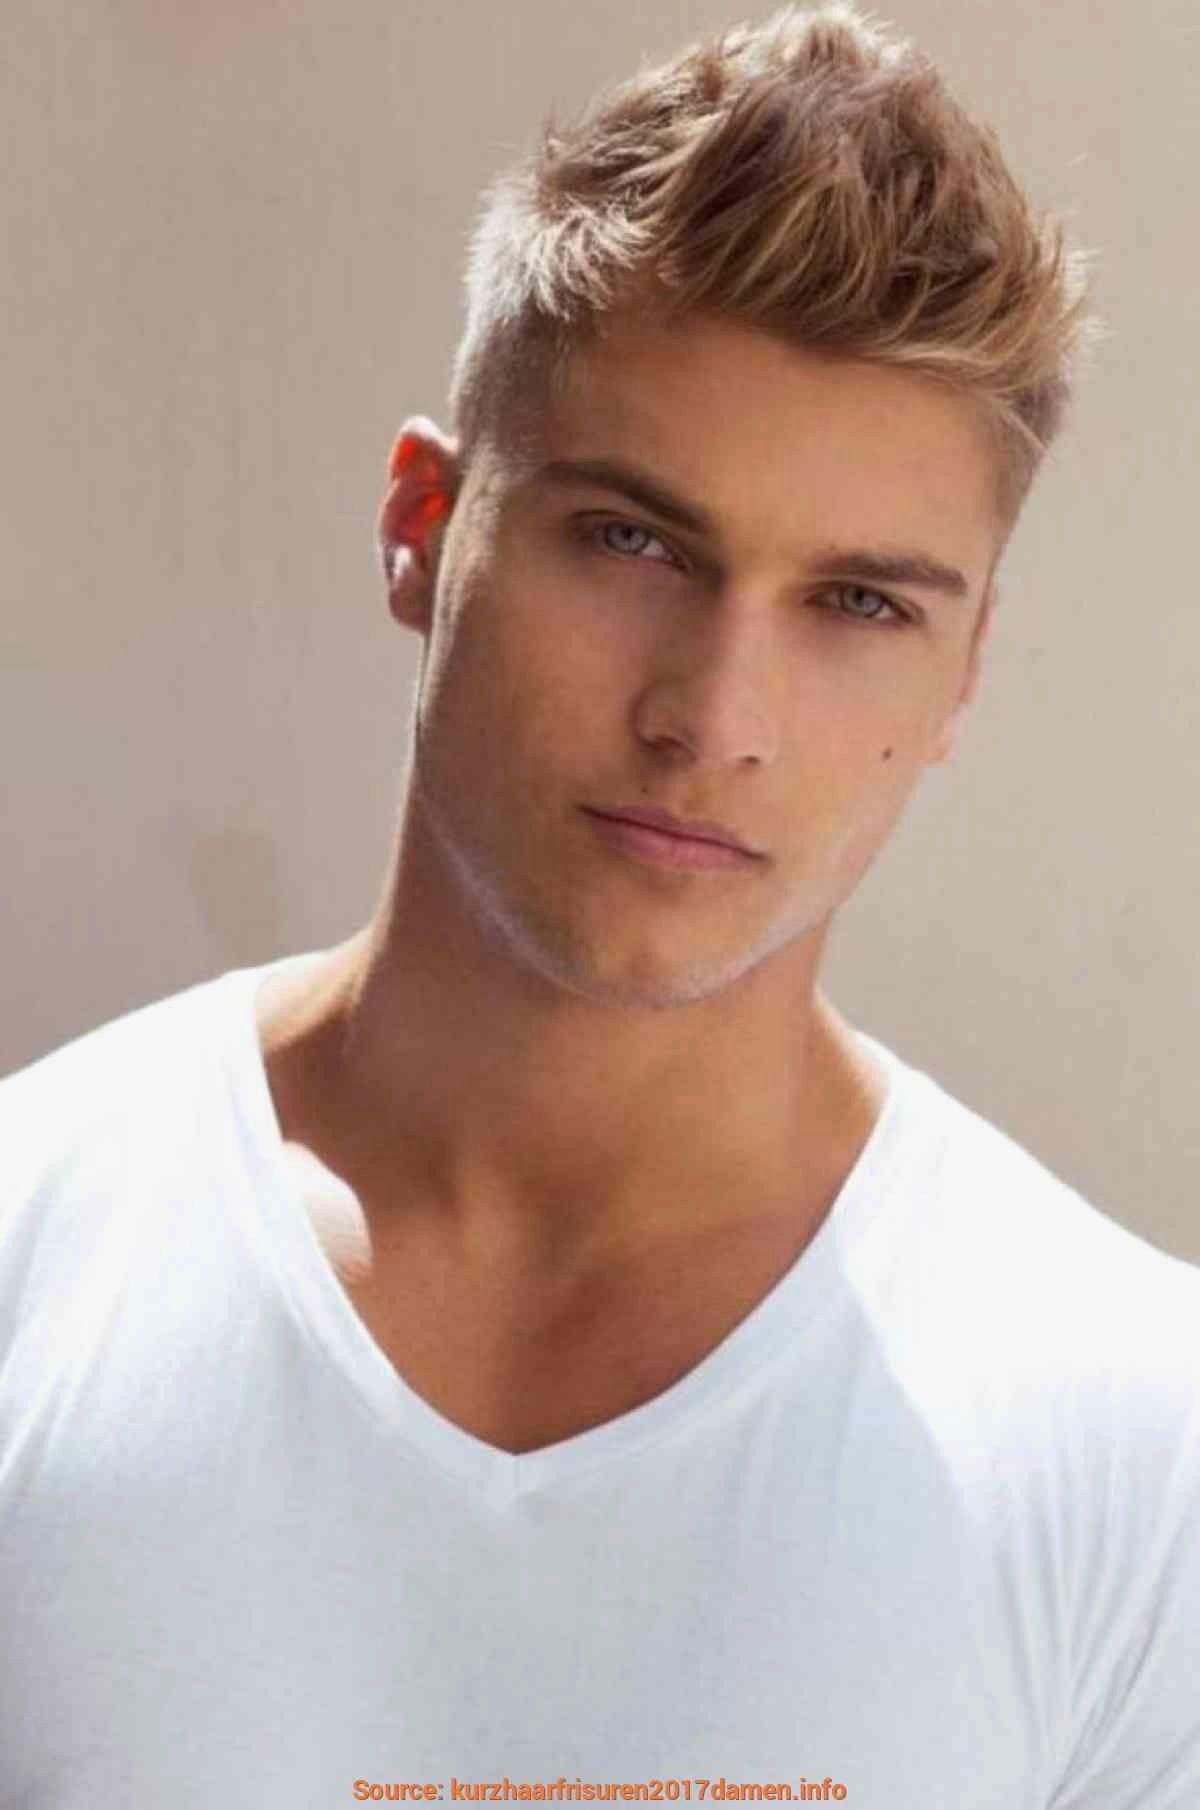 Frisuren Manner Kurz Blond Frisurentrends Haare Manner Haarschnitt Manner Herrenschnitte